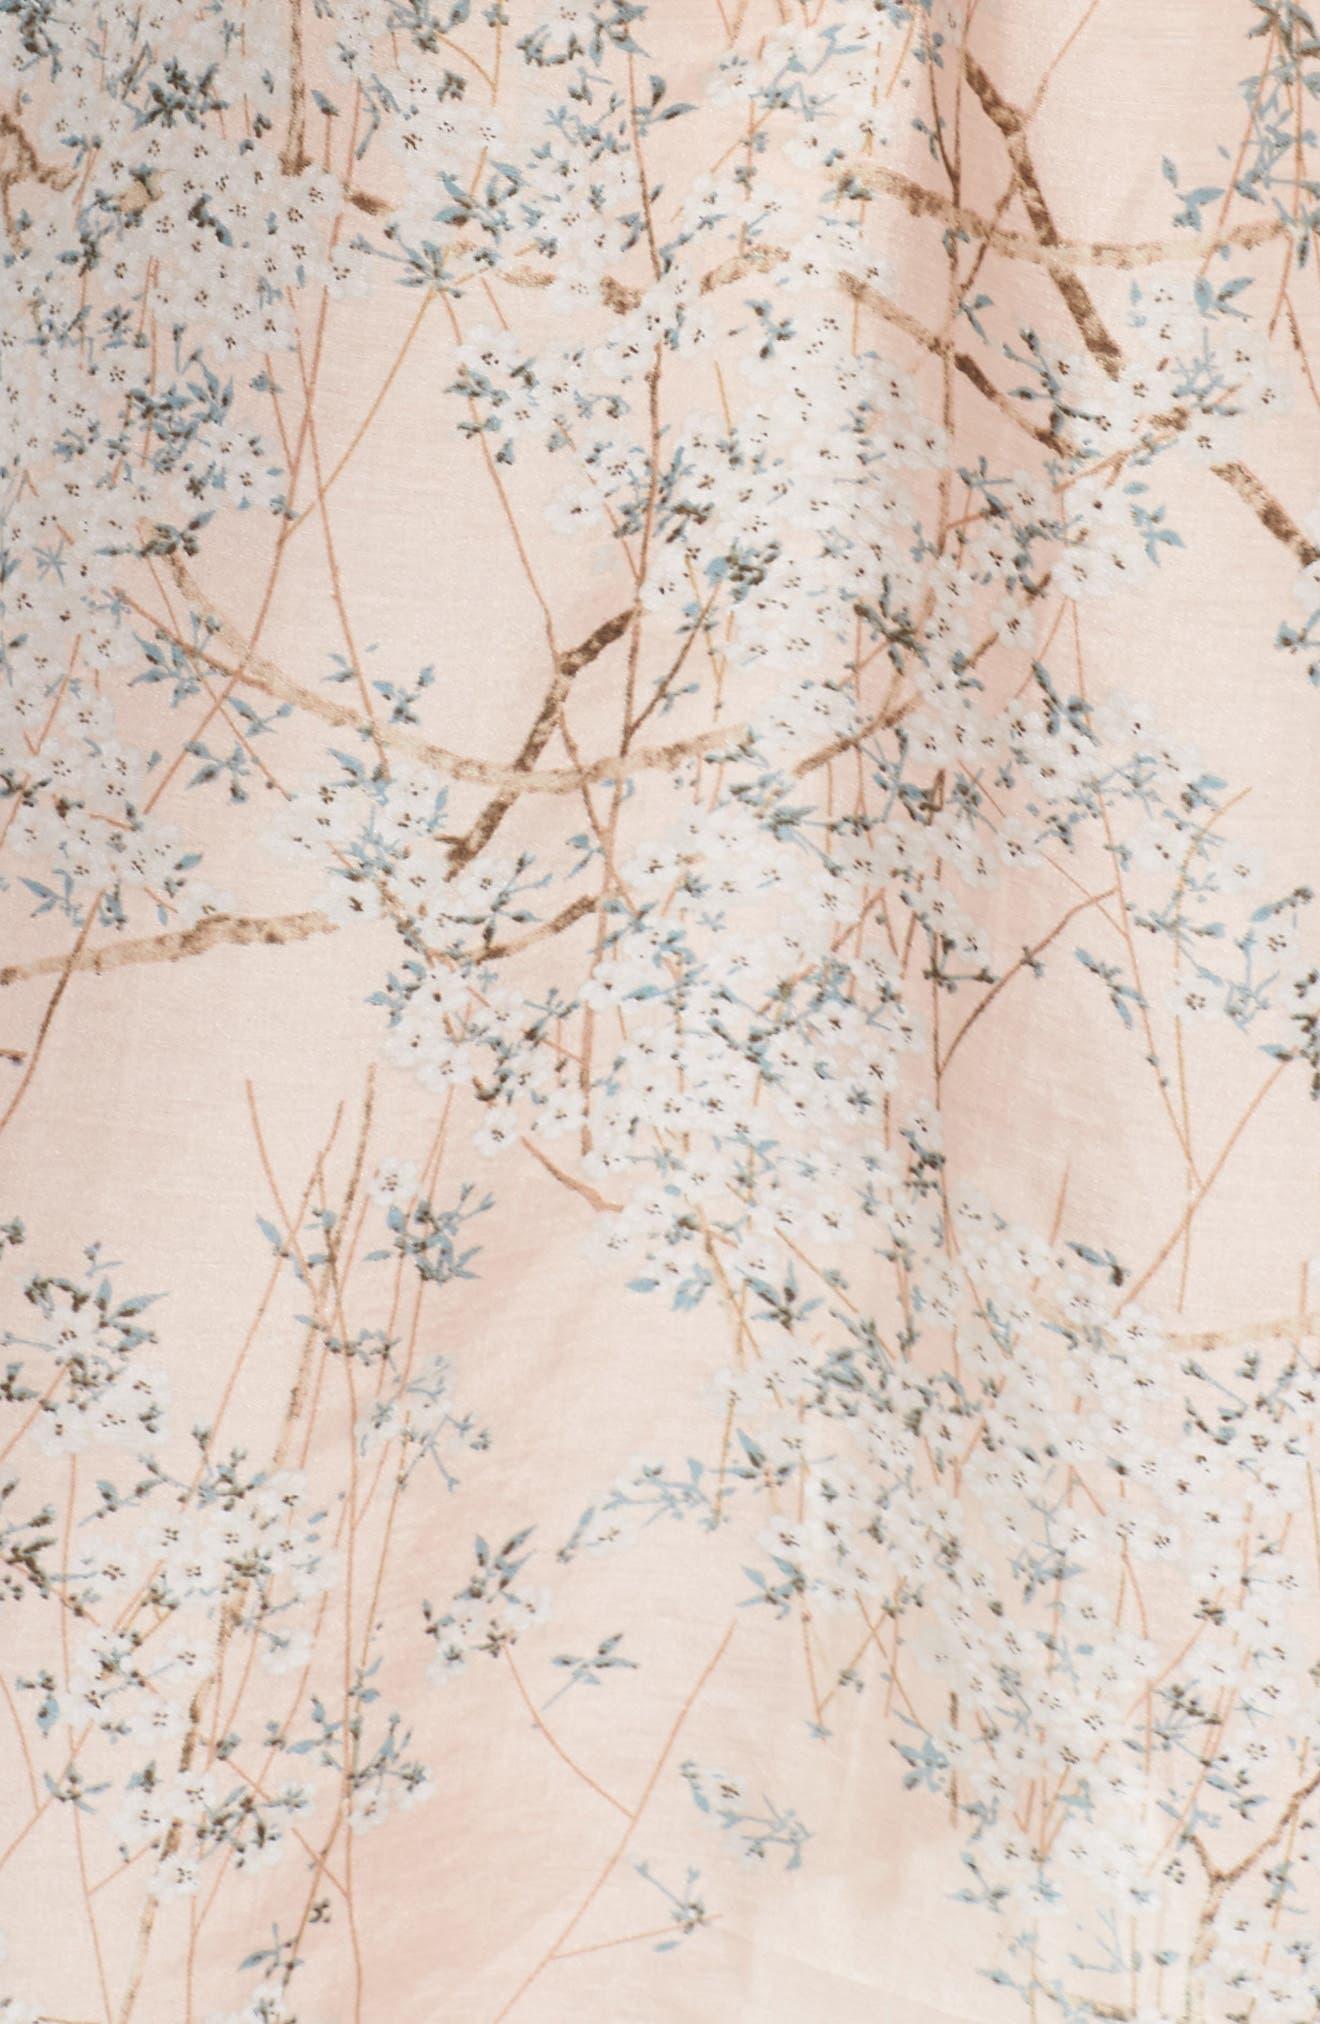 Cherry Blossom Cotton & Silk Chemise,                             Alternate thumbnail 6, color,                             Pink